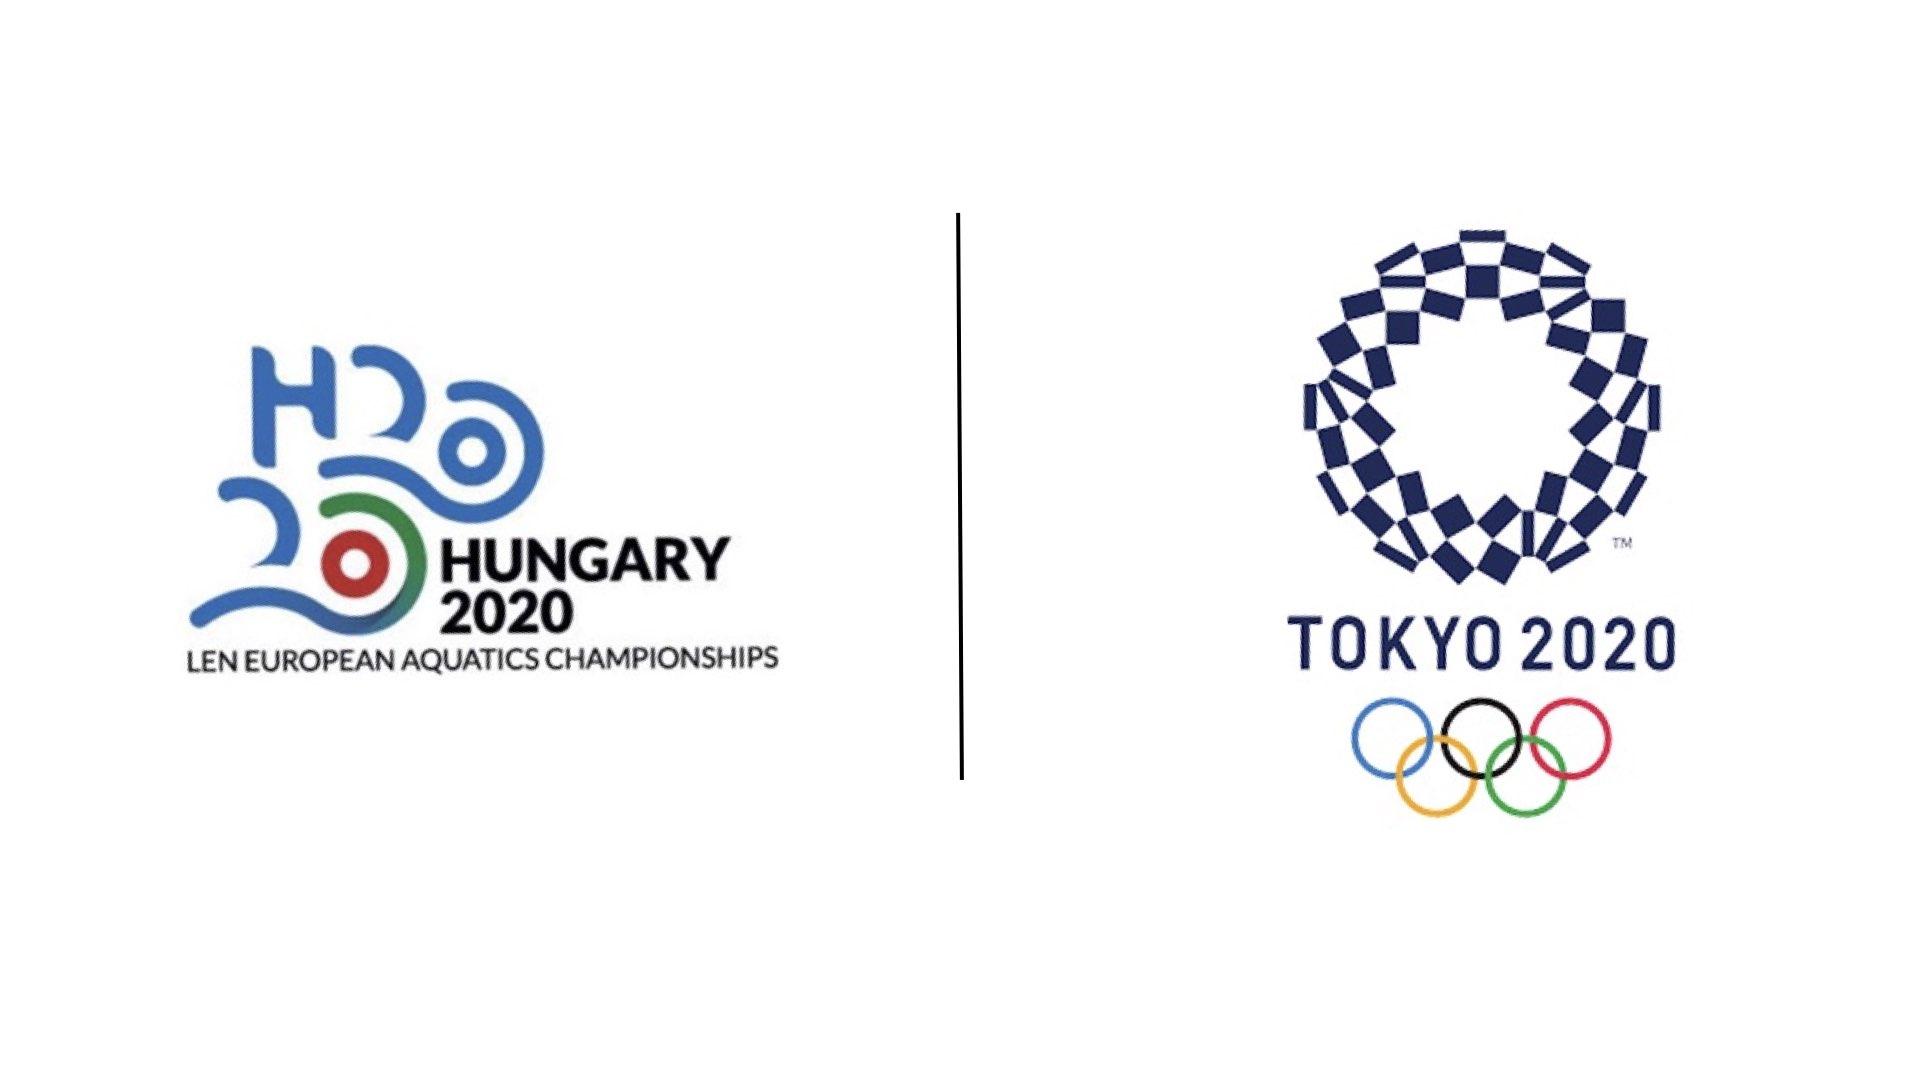 Europei di Budapest vs Olimpiadi di Tokyo